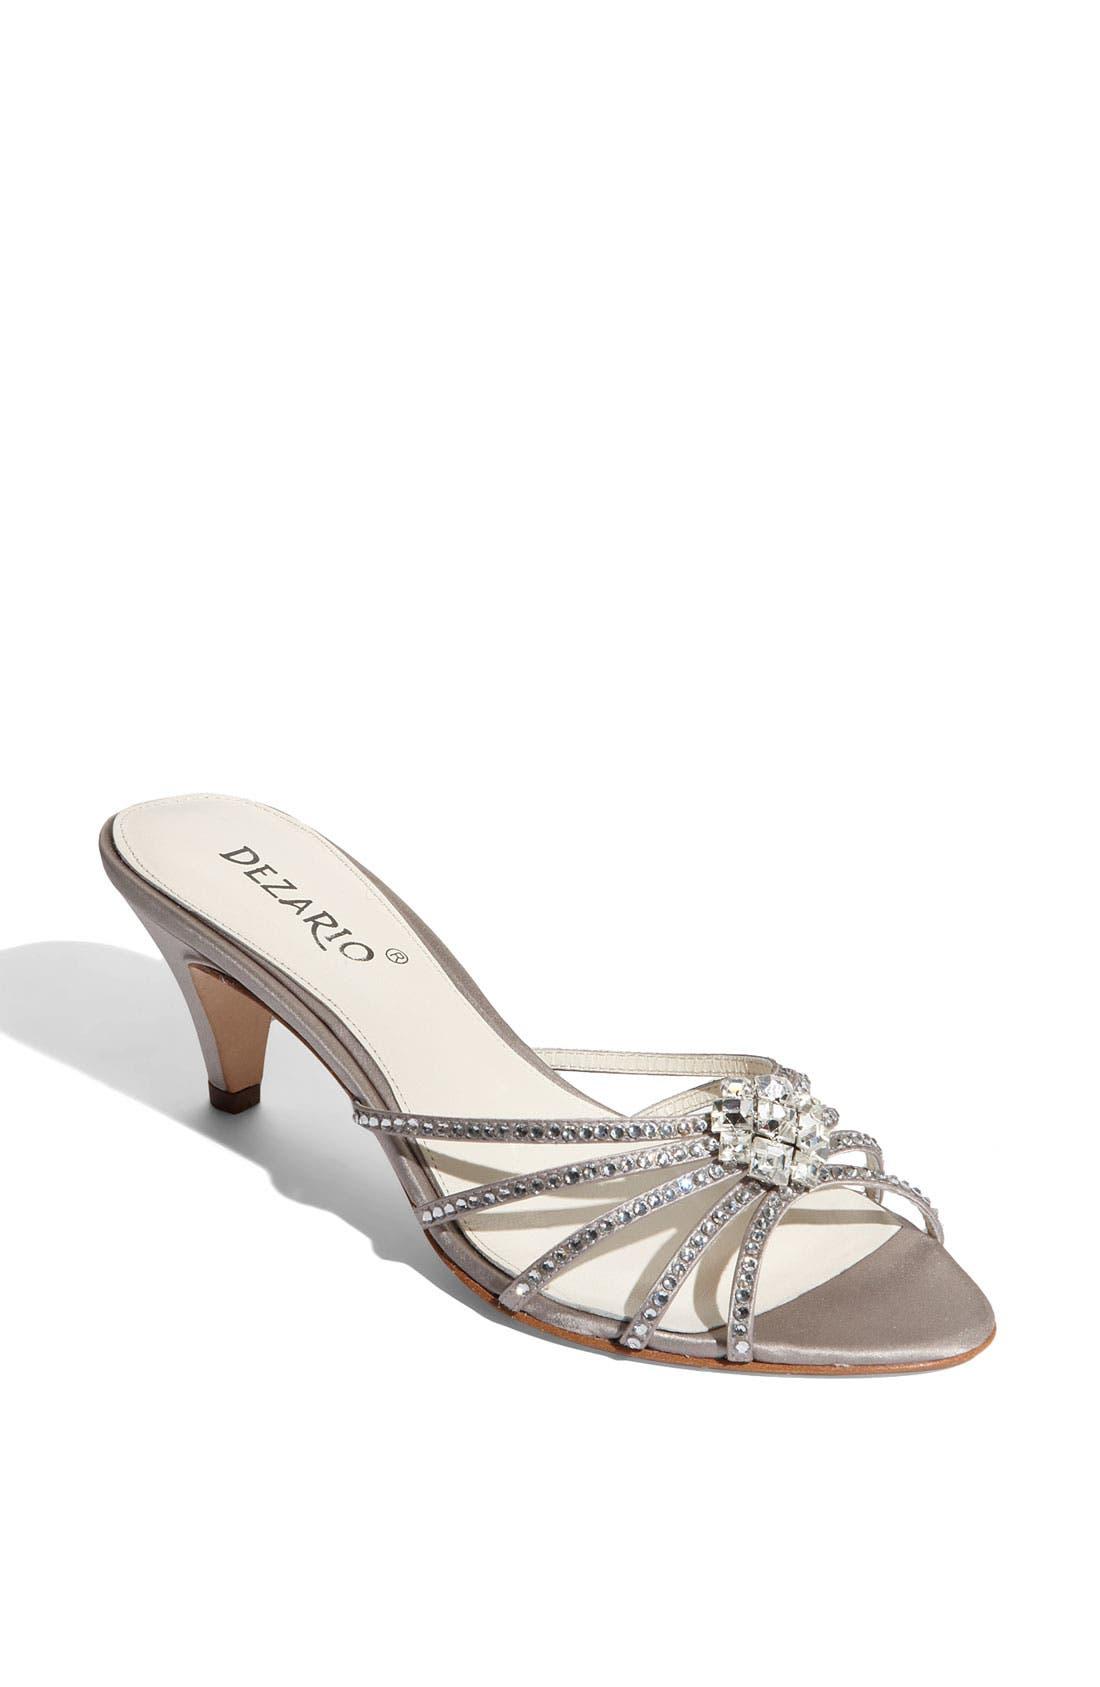 Main Image - Dezario 'Lady' Slide Sandal